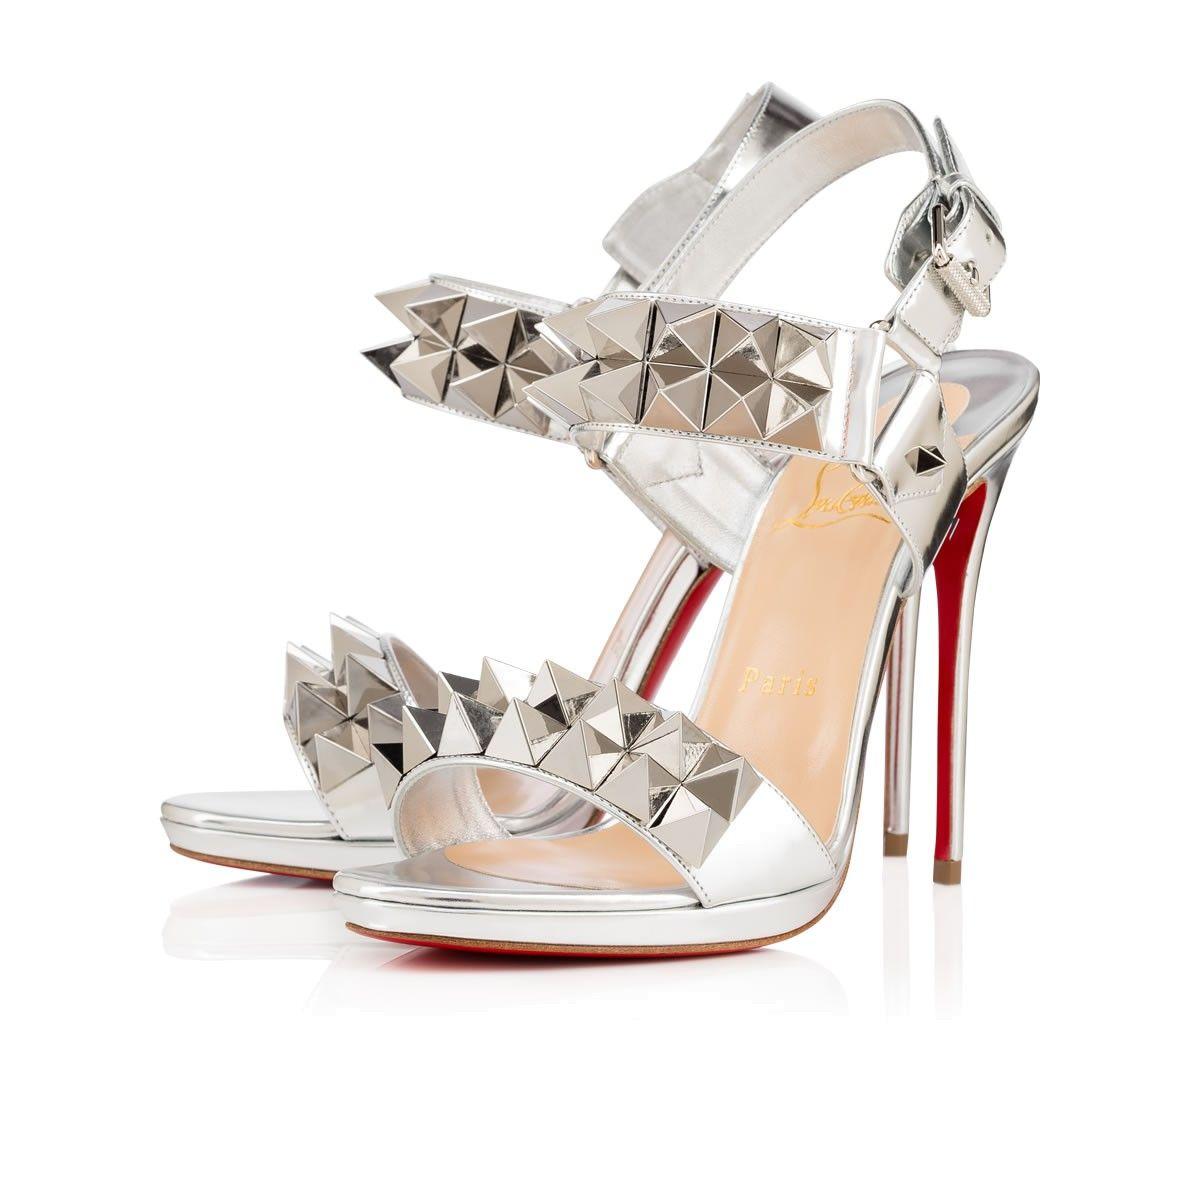 size 40 0b36e edb89 Women Shoes - Miziggoo 120 Specchio - Christian Louboutin ...